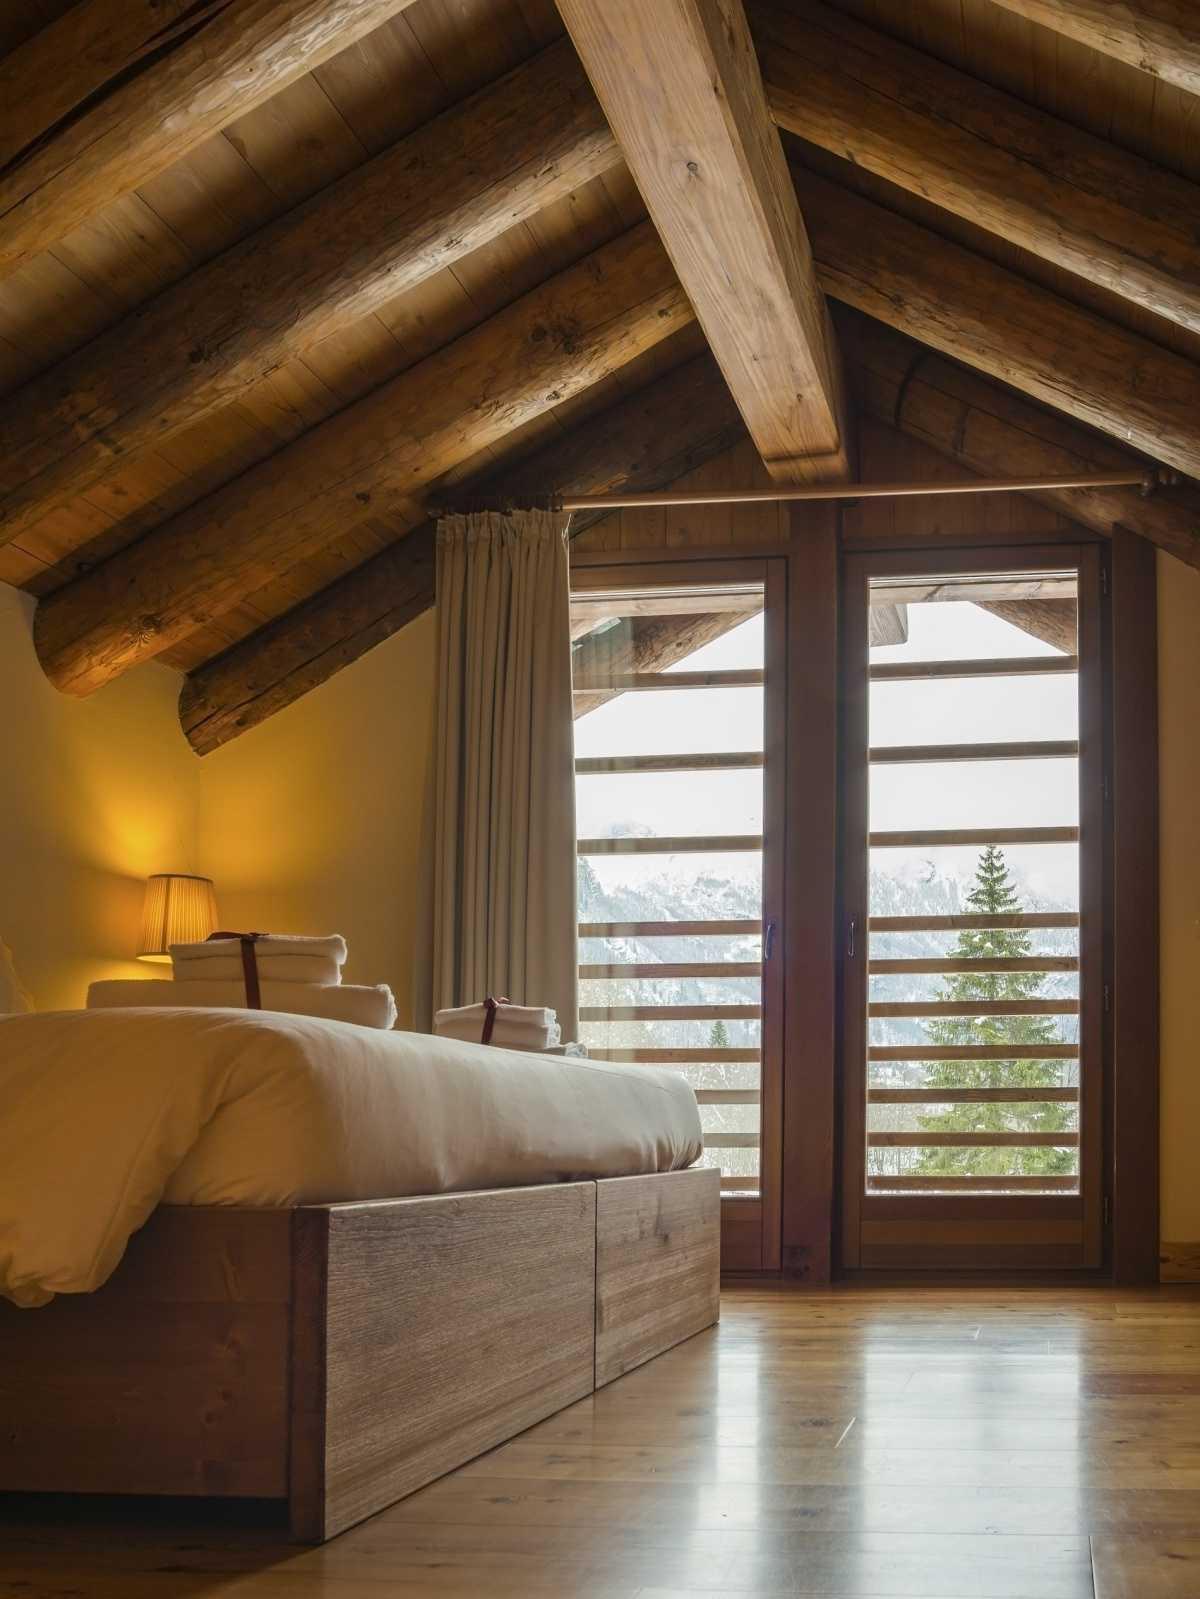 Pietre Gemelle Resort - Riva Valdobbia